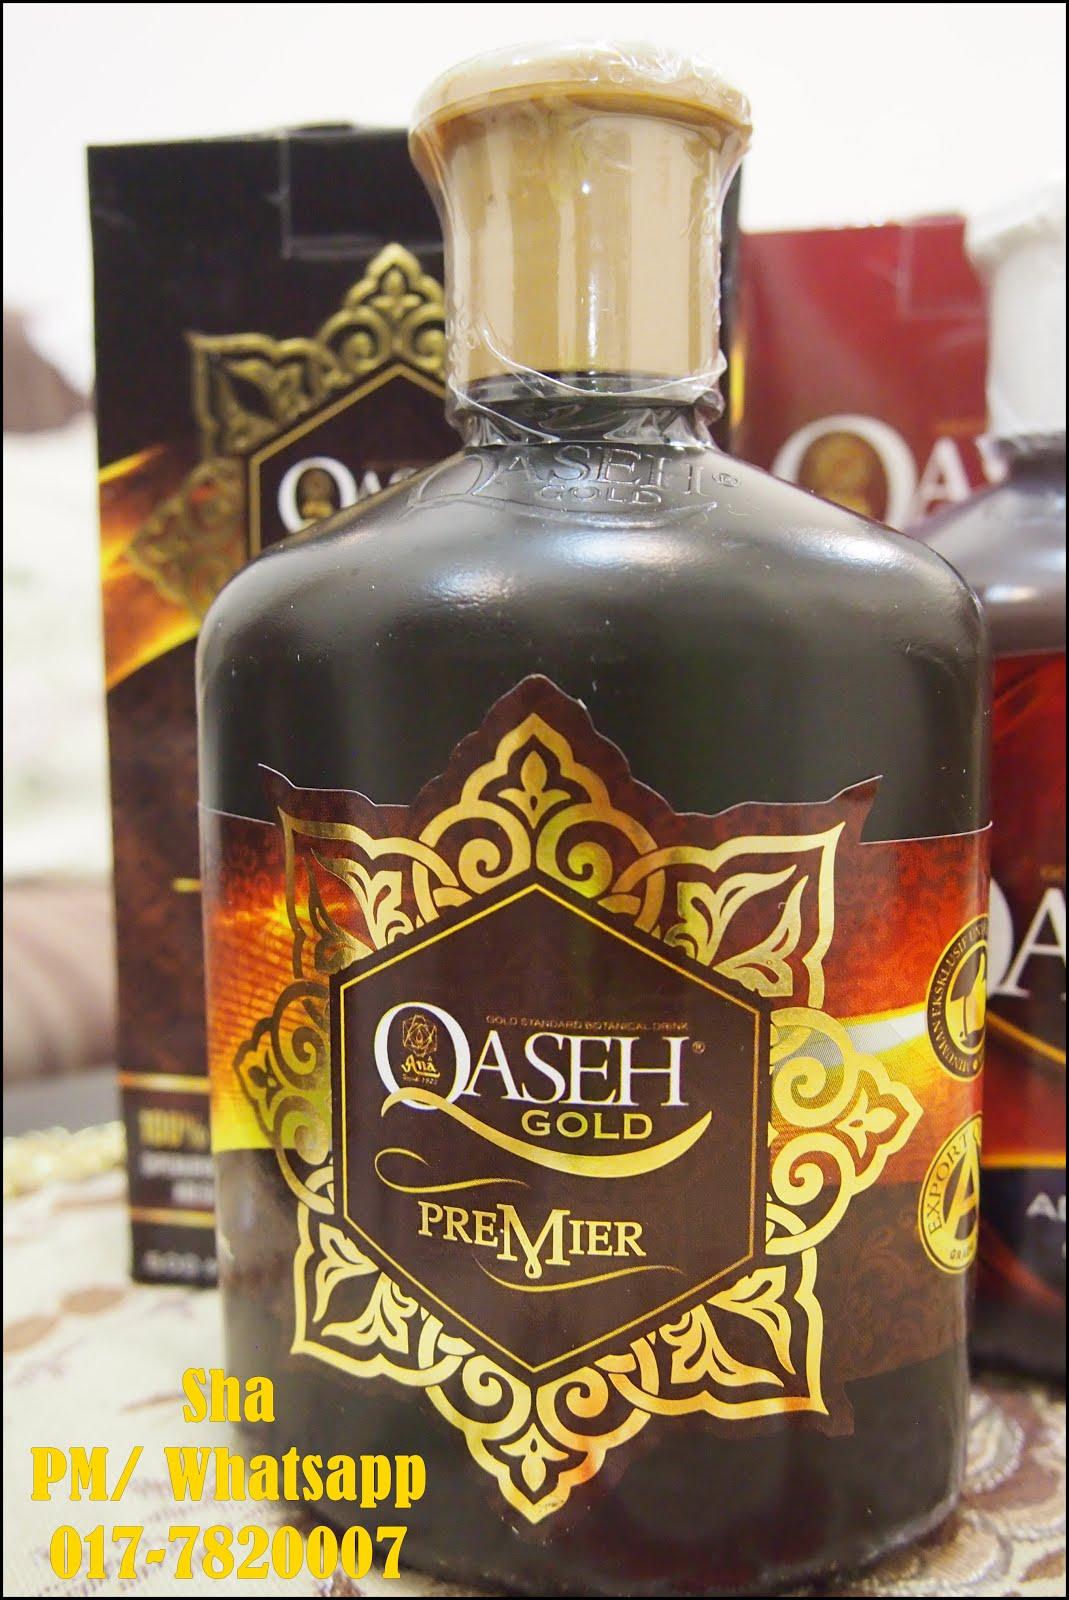 QASEH GOLD PREMIER